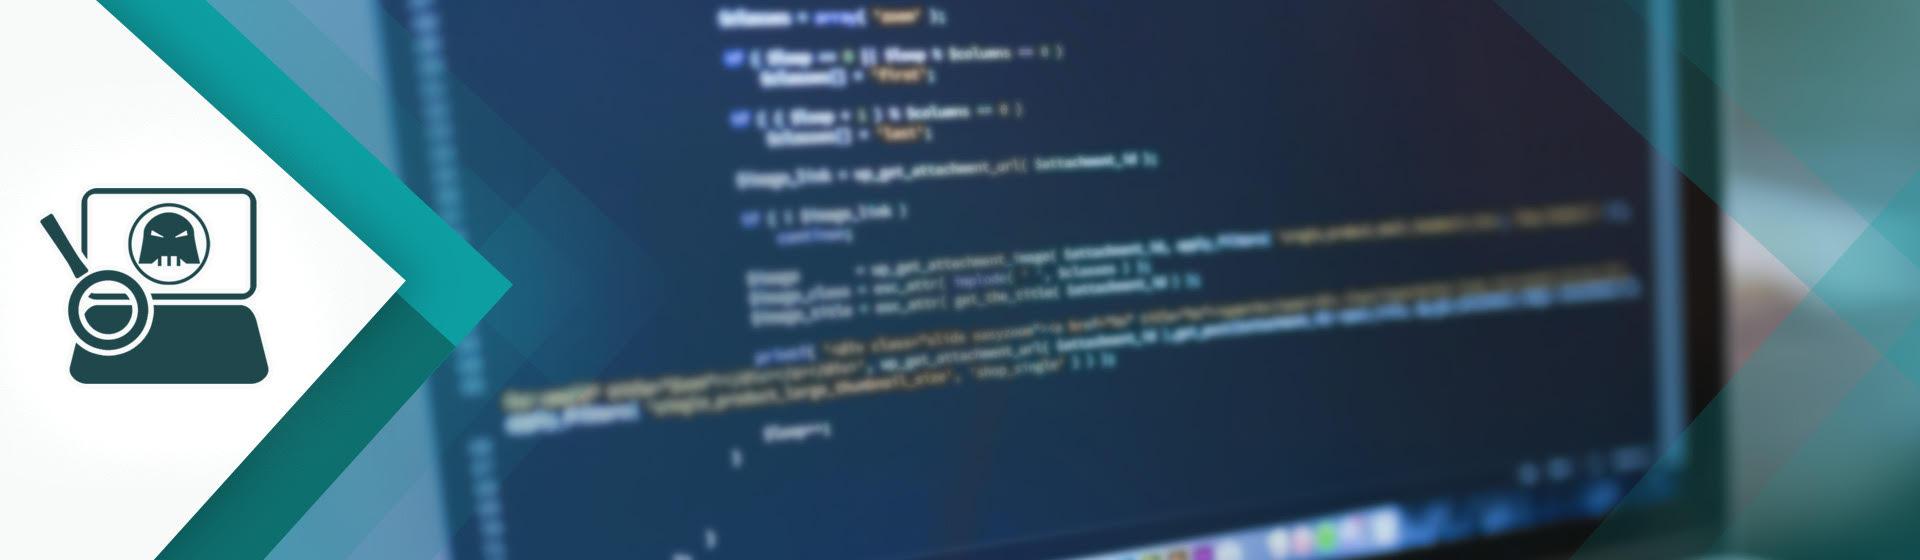 Banner forense malware